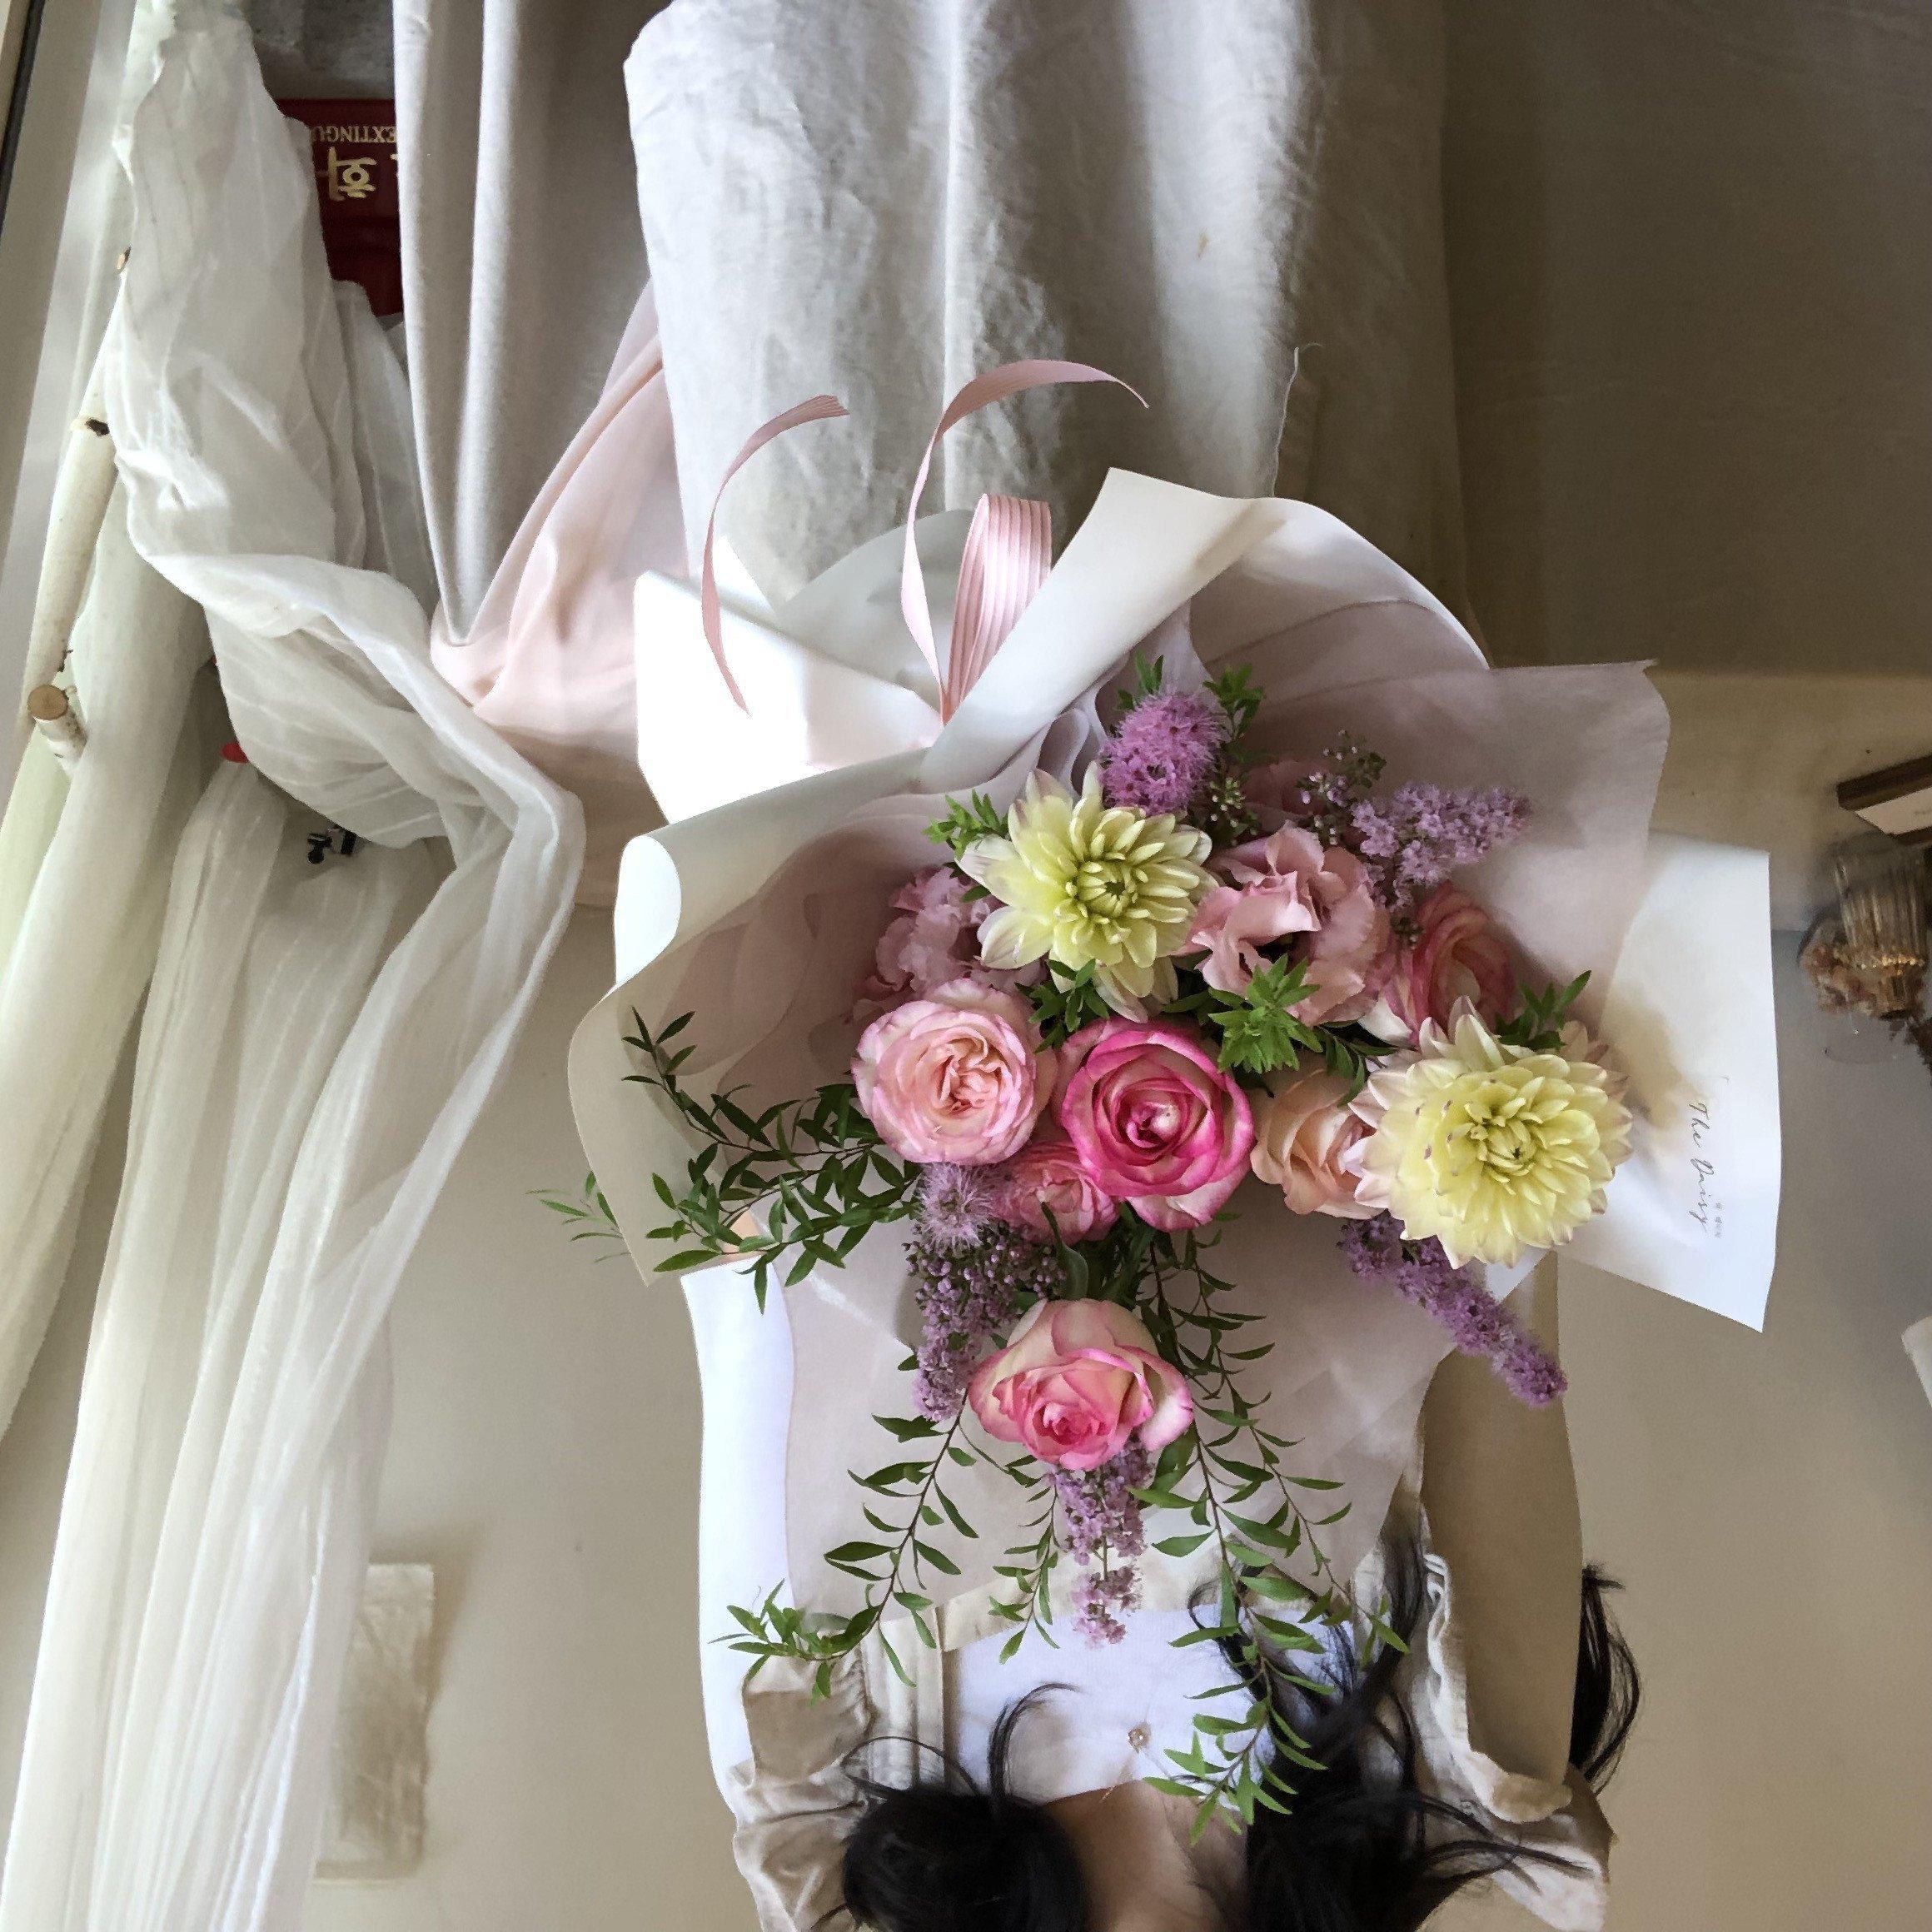 Flower Delivery in Korea